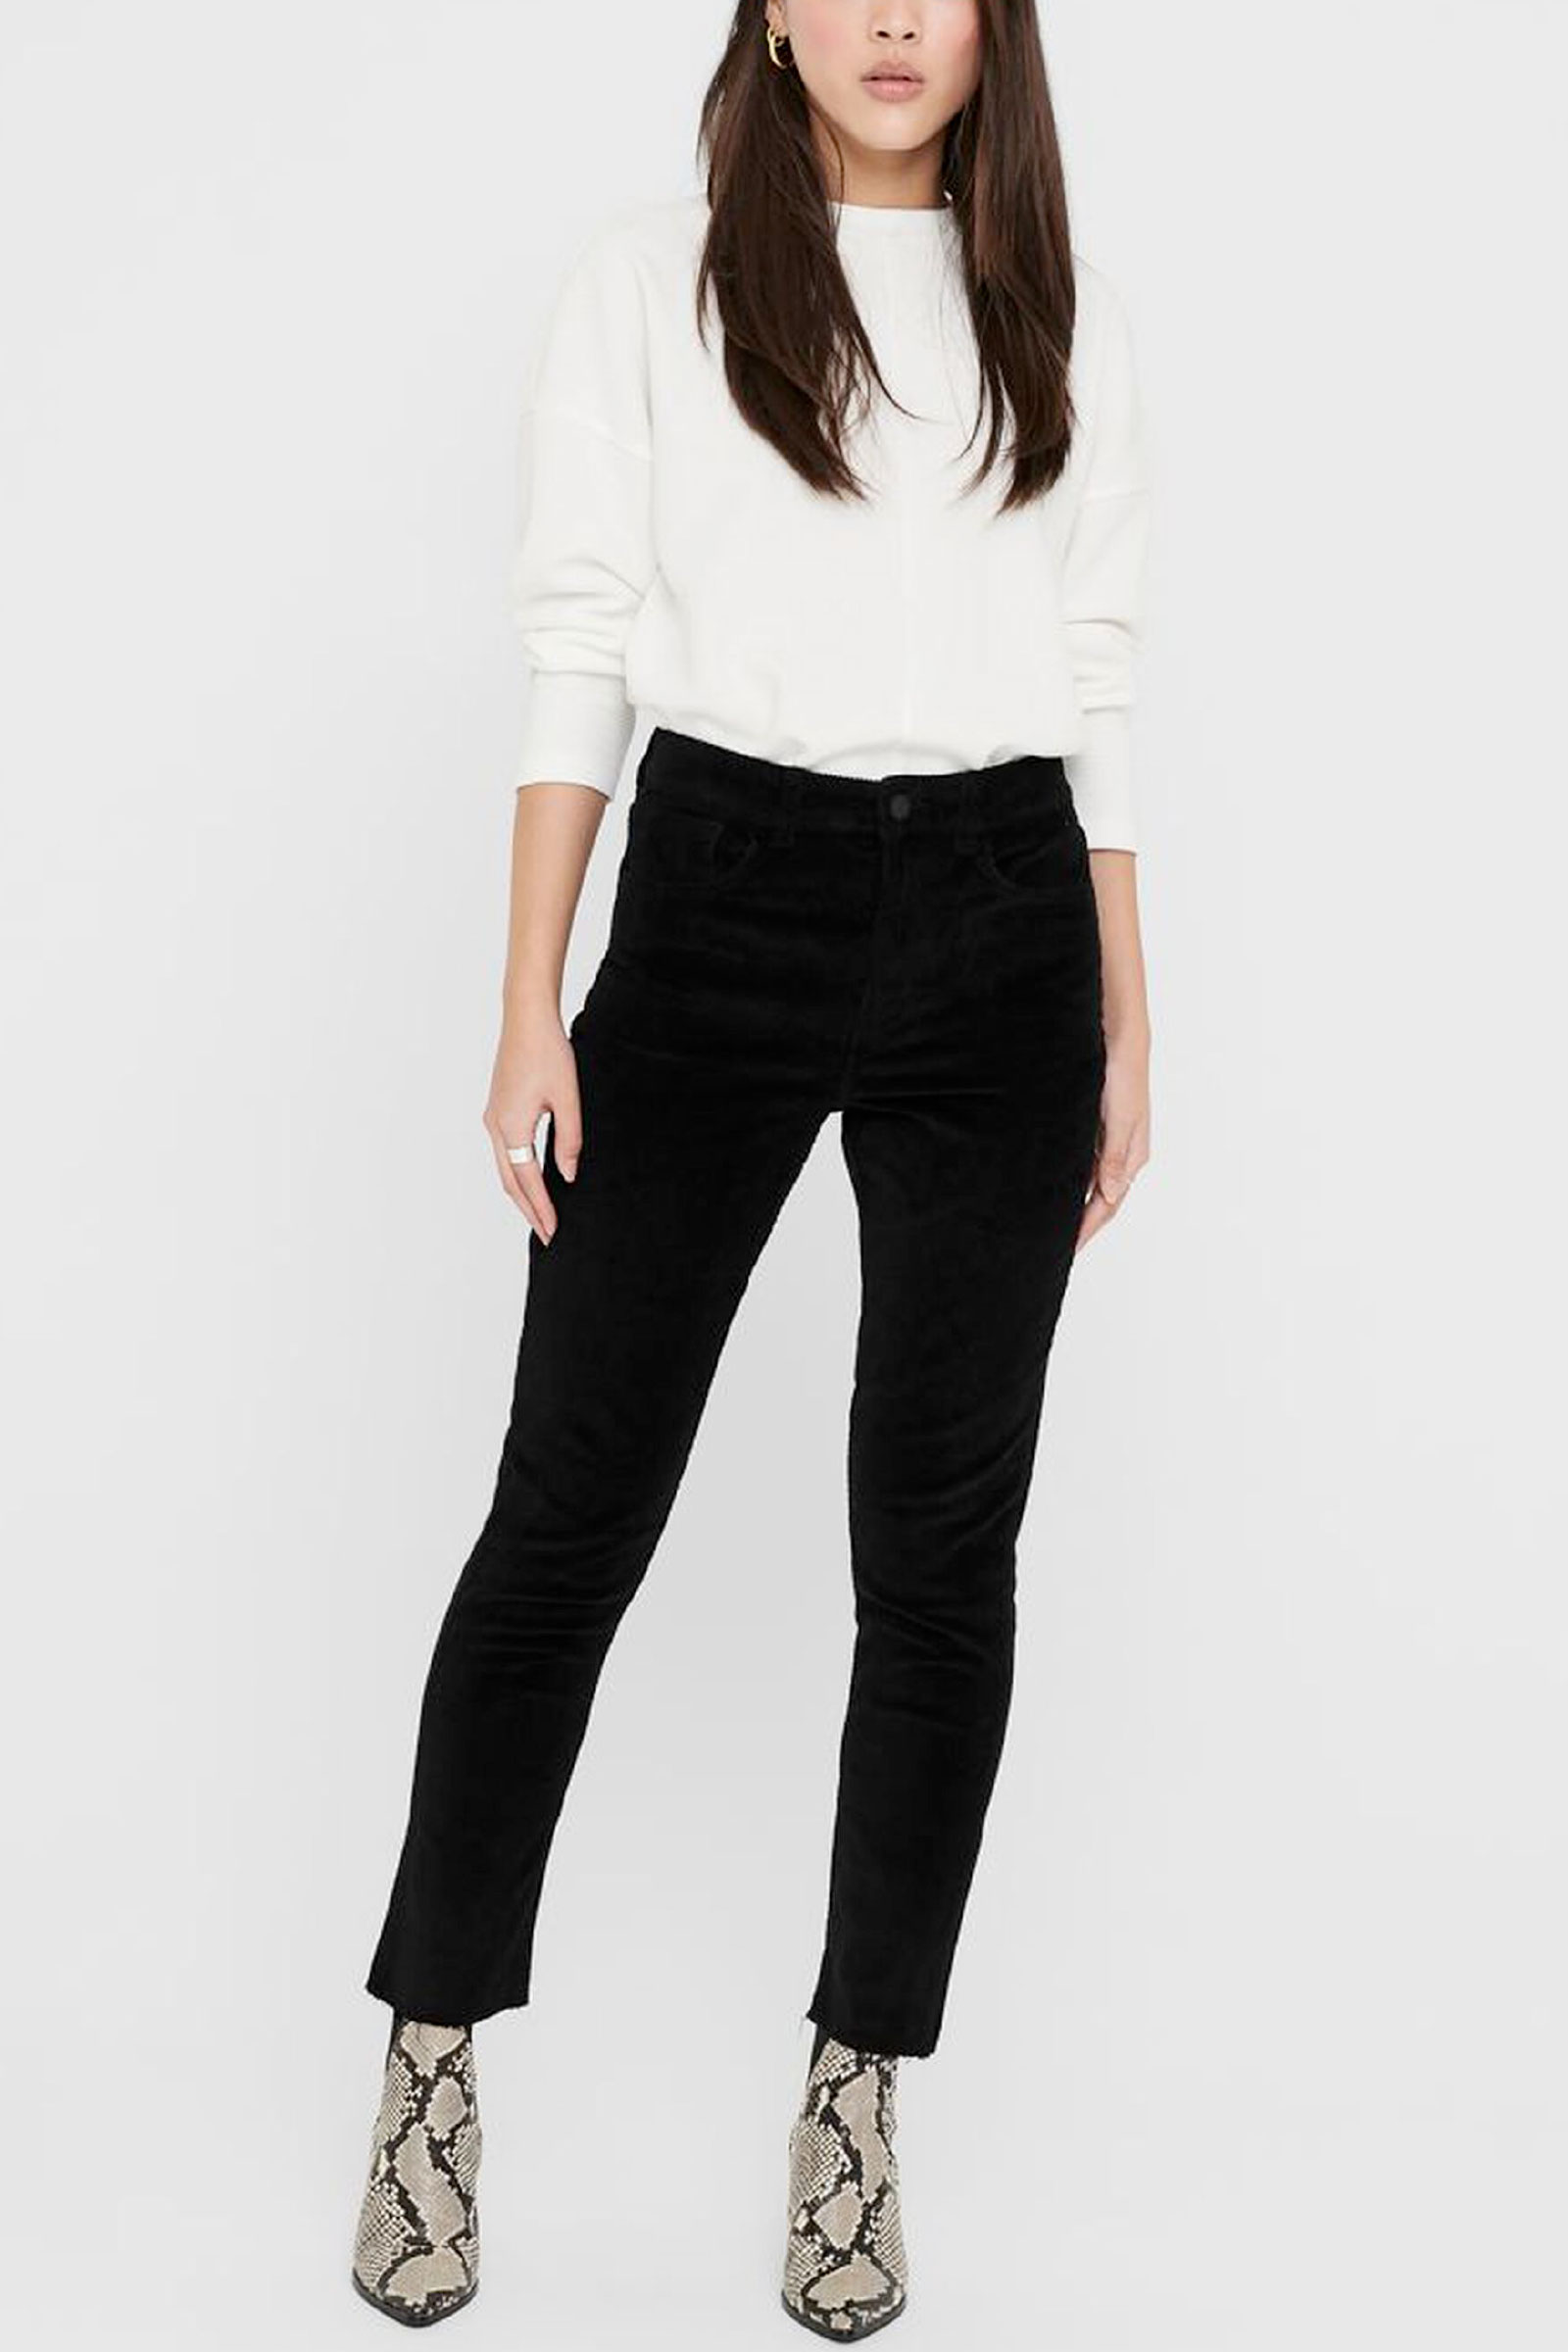 Pantalone Donna Modello EMILY ONLY   Pantalone   15195424Black